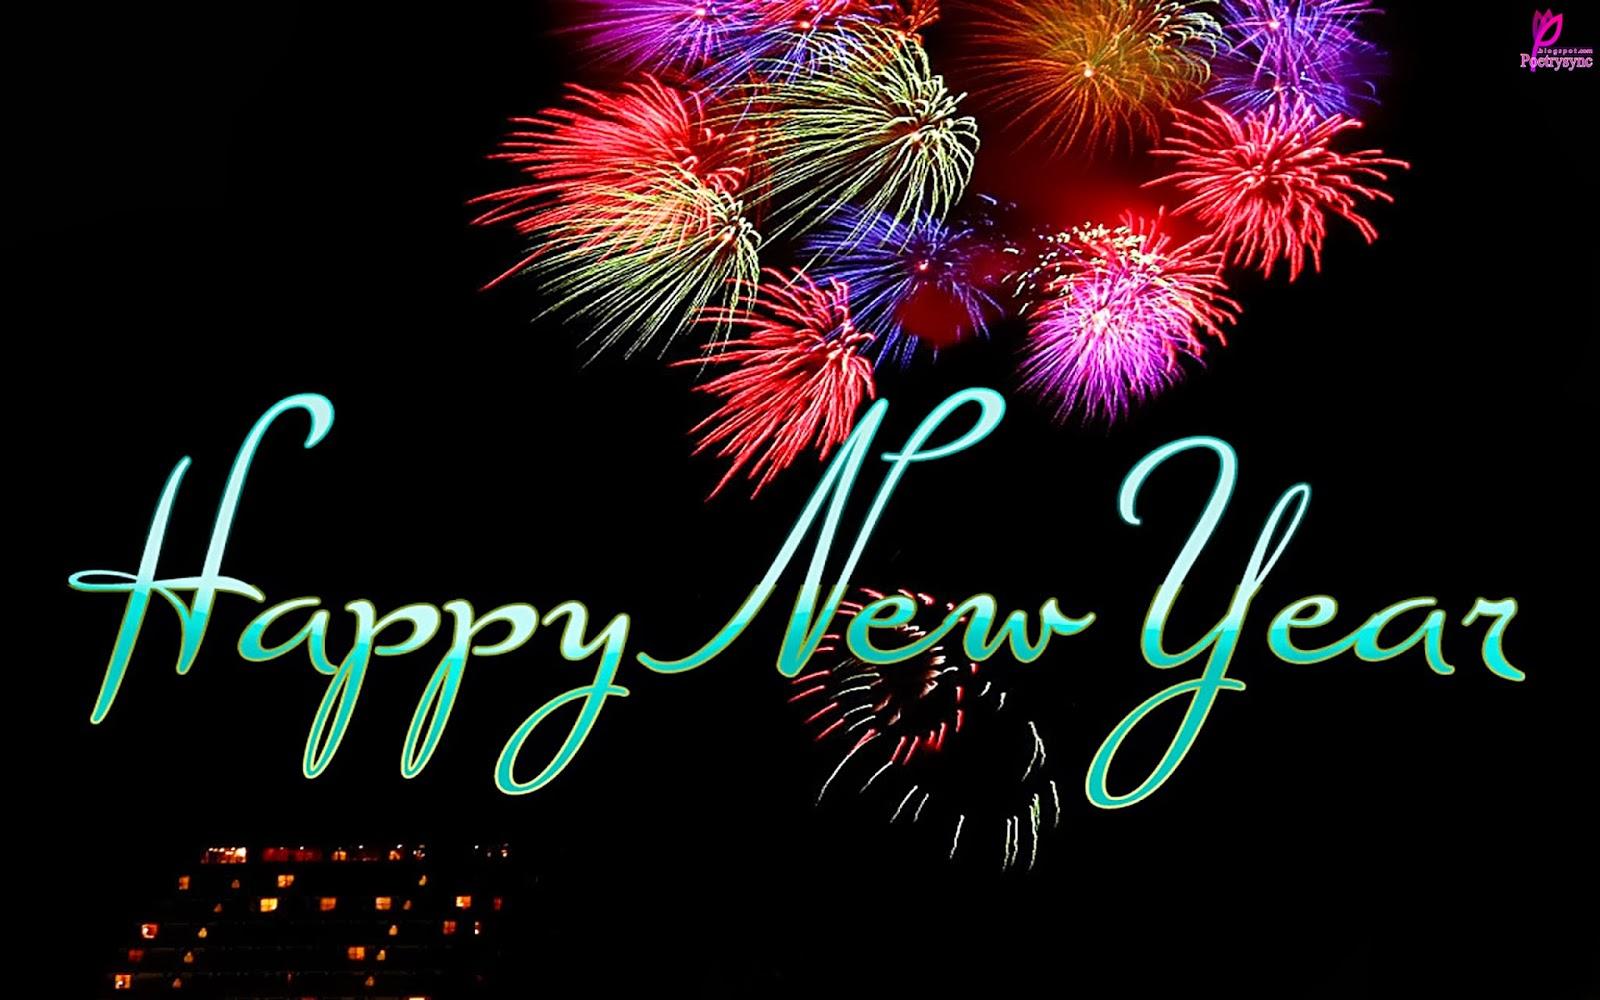 Happy New Year Pgcps Mess